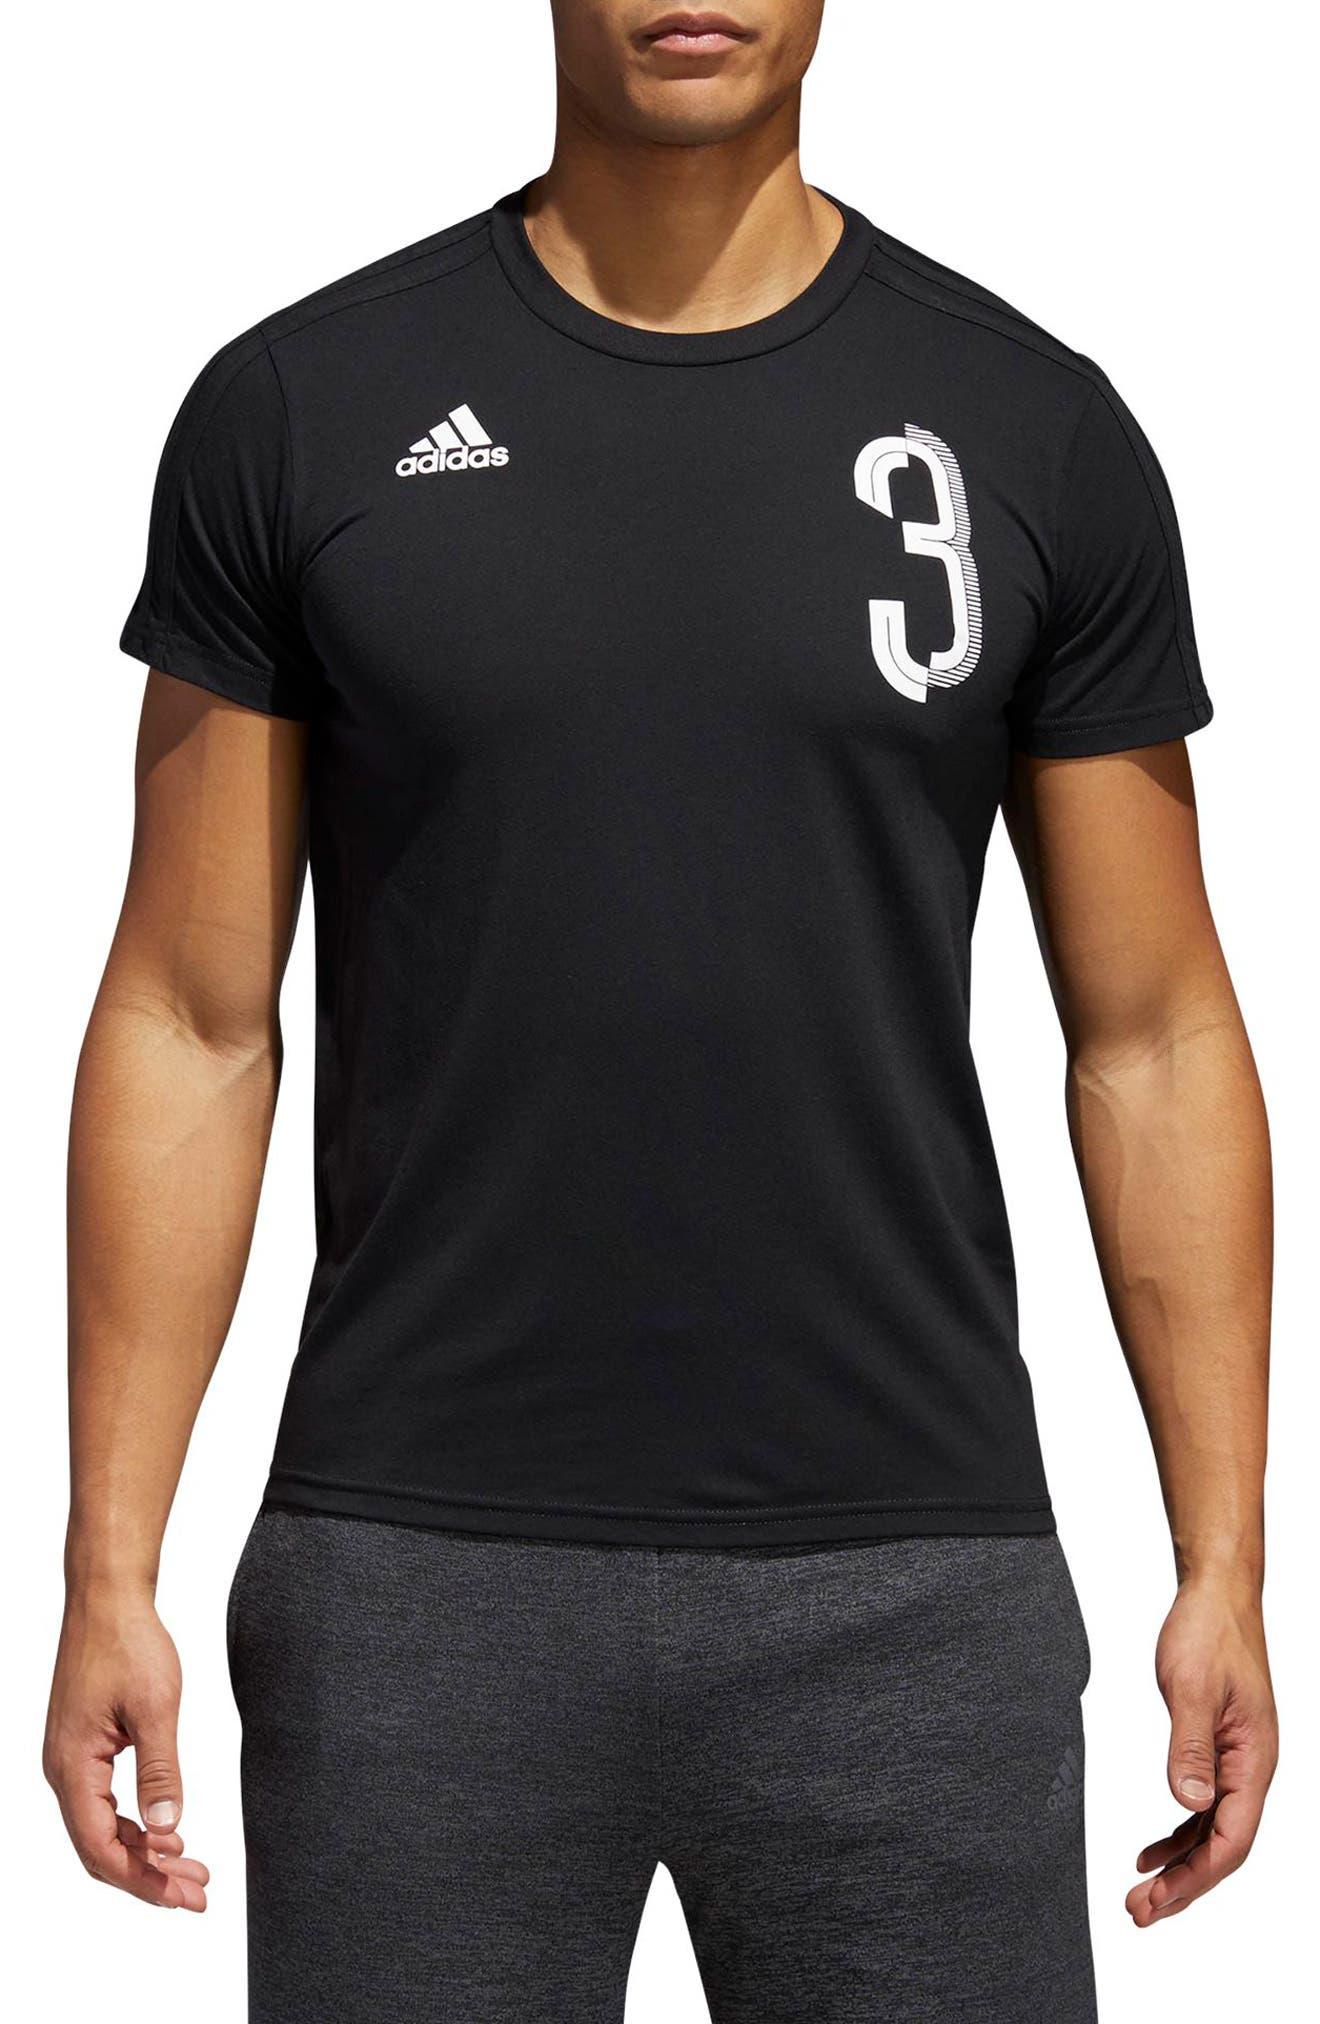 Soccer Slim Fit T-Shirt,                             Main thumbnail 1, color,                             Black / White